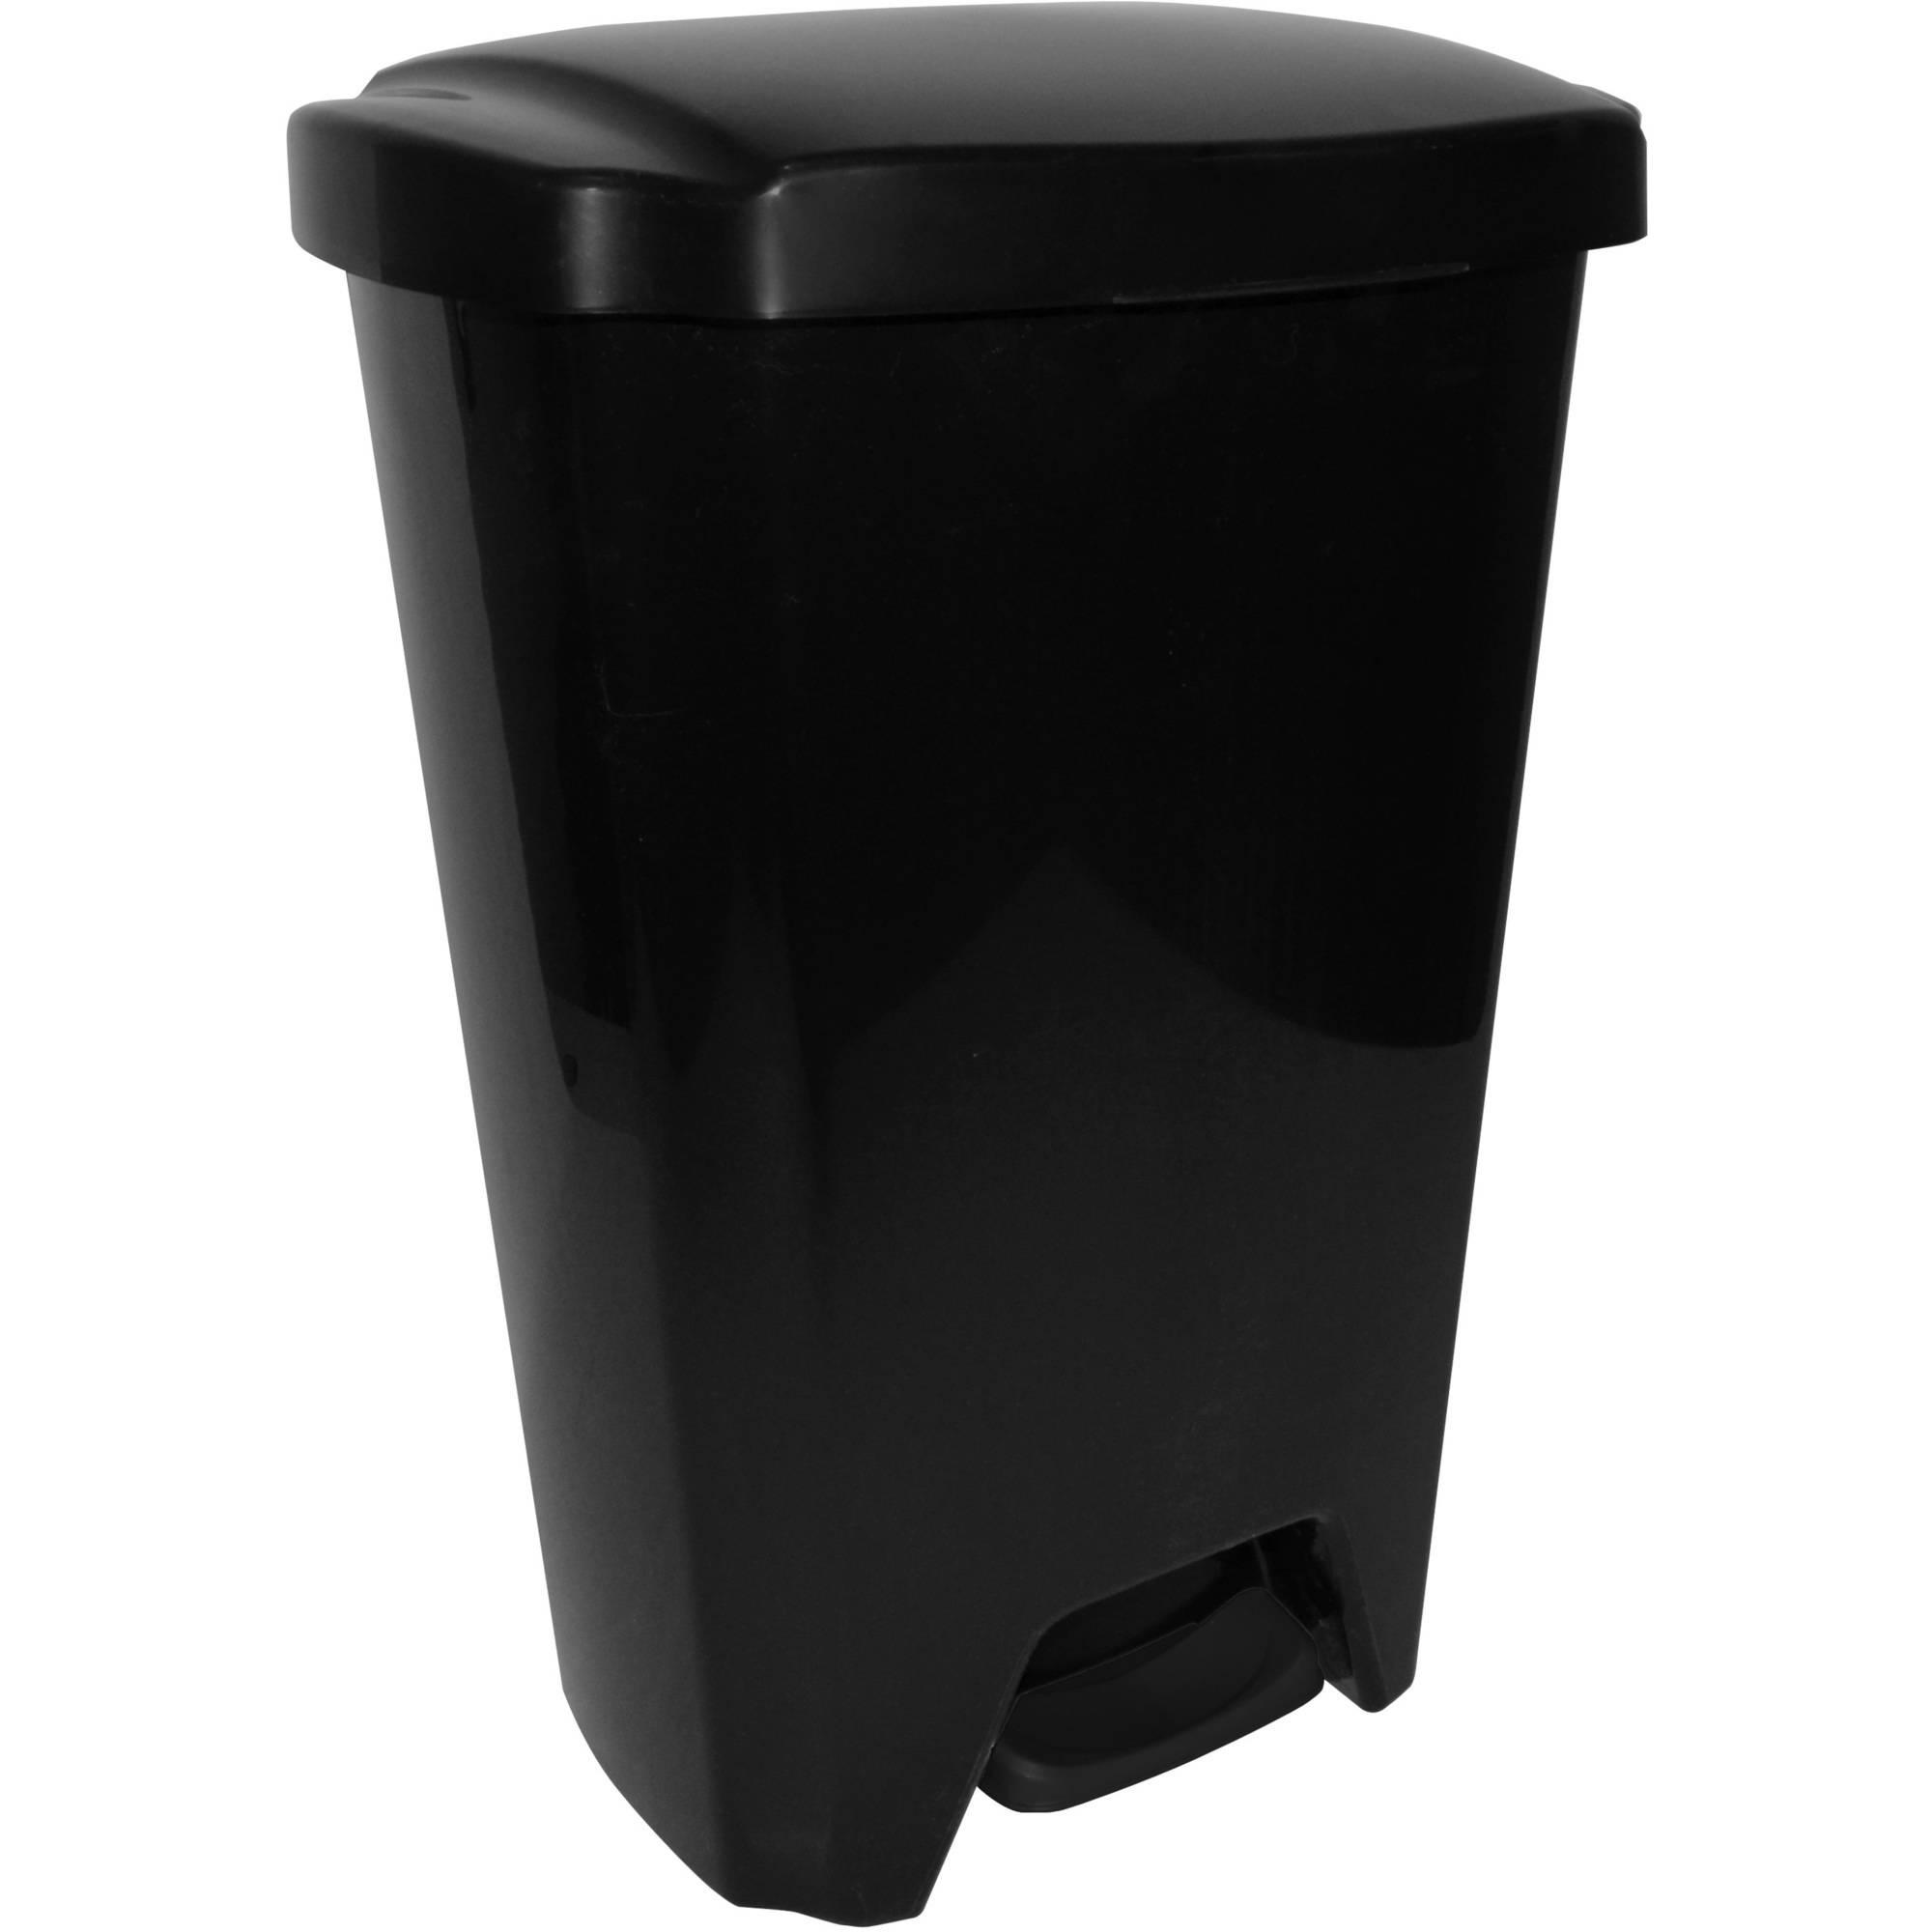 Hefty 13-Gallon Step-On Trash Can, Black